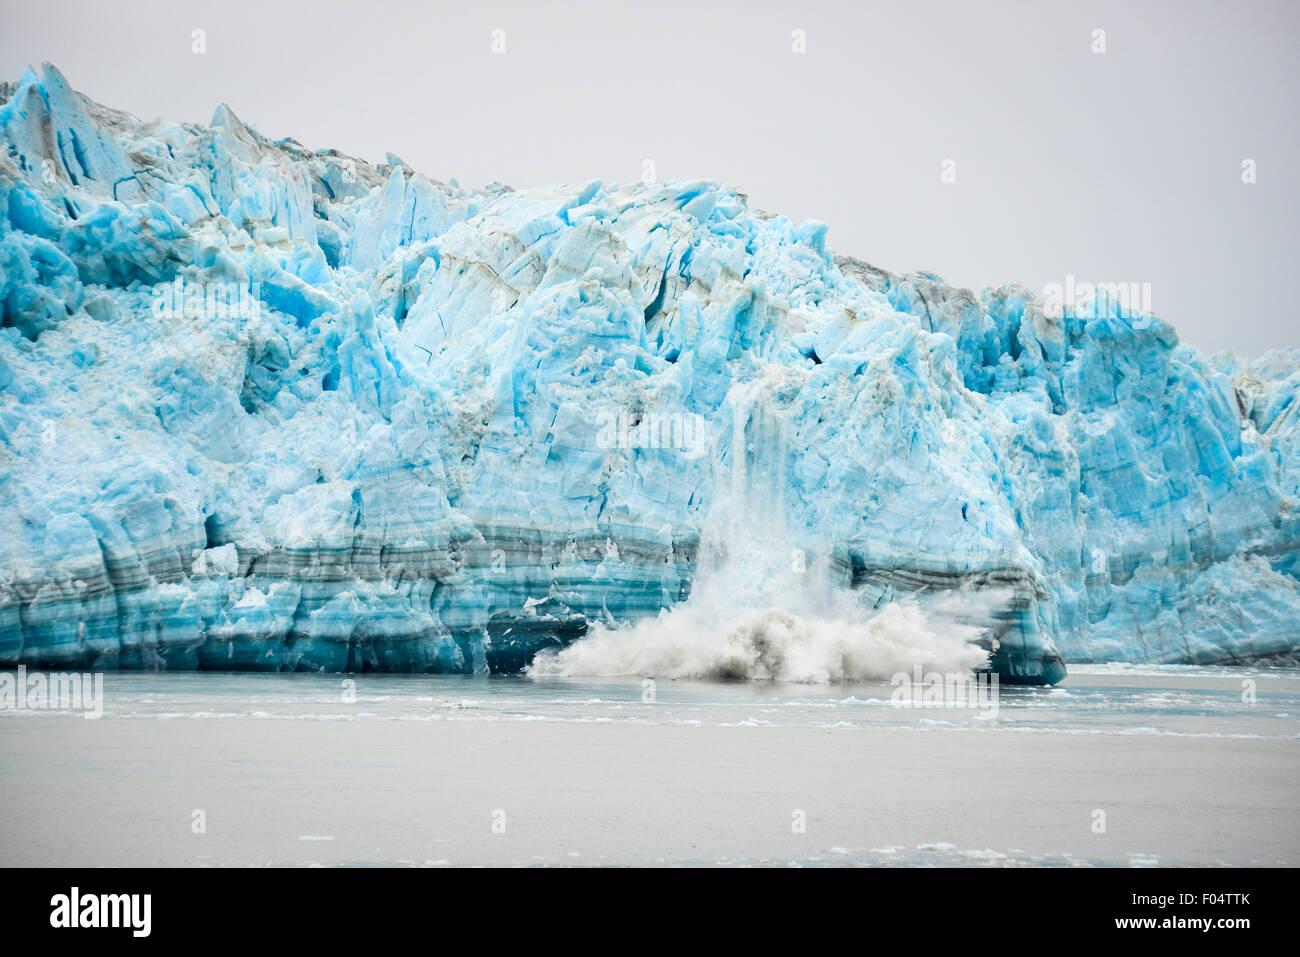 Hubbard Gletscher Kalben - natürliches Phänomen Stockbild